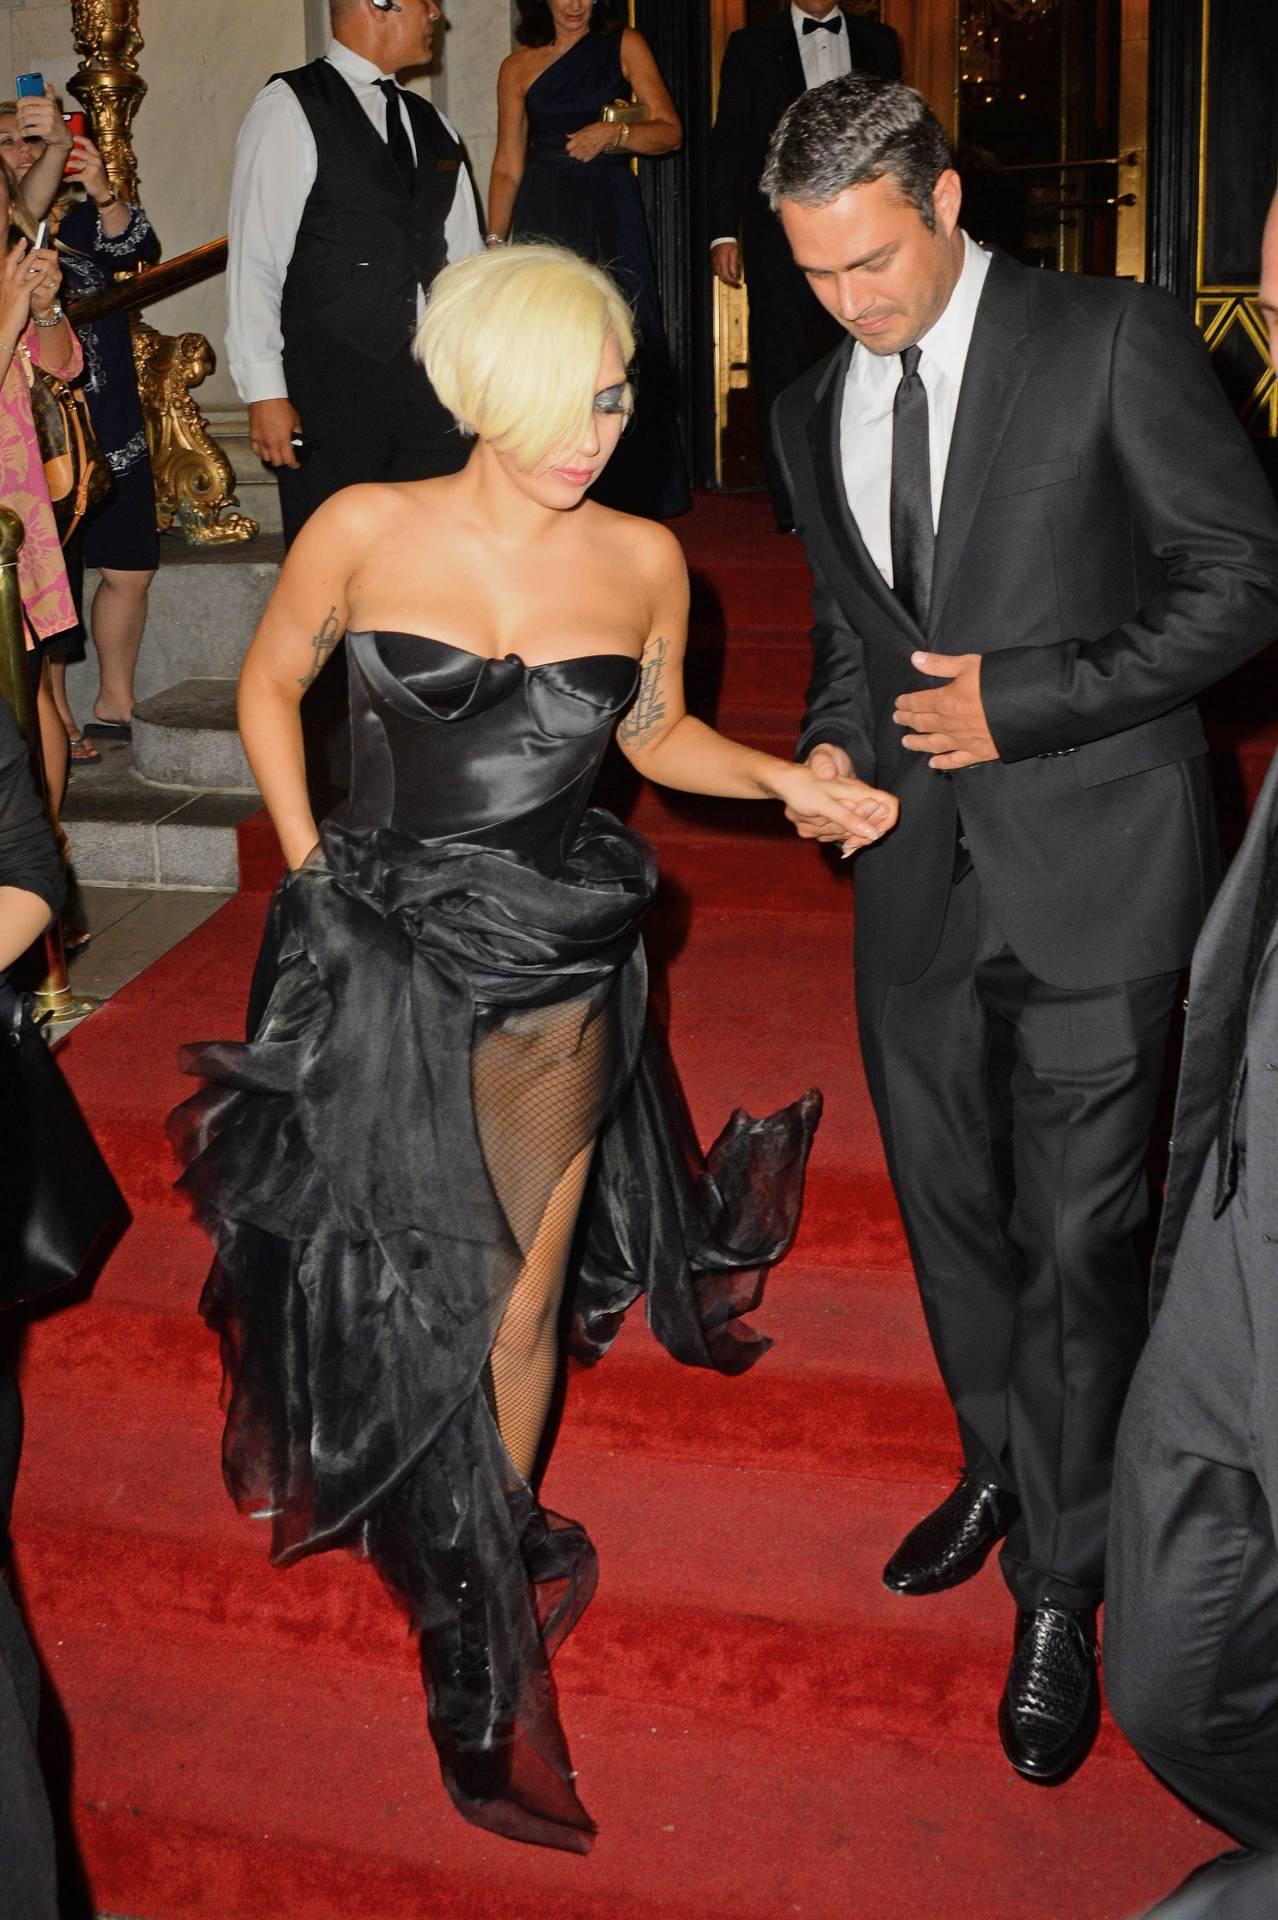 Lady Gaga and Taylor Kinney. - Page 3 Tumblr_nbhzfttufj1rz7rr7o2_1280